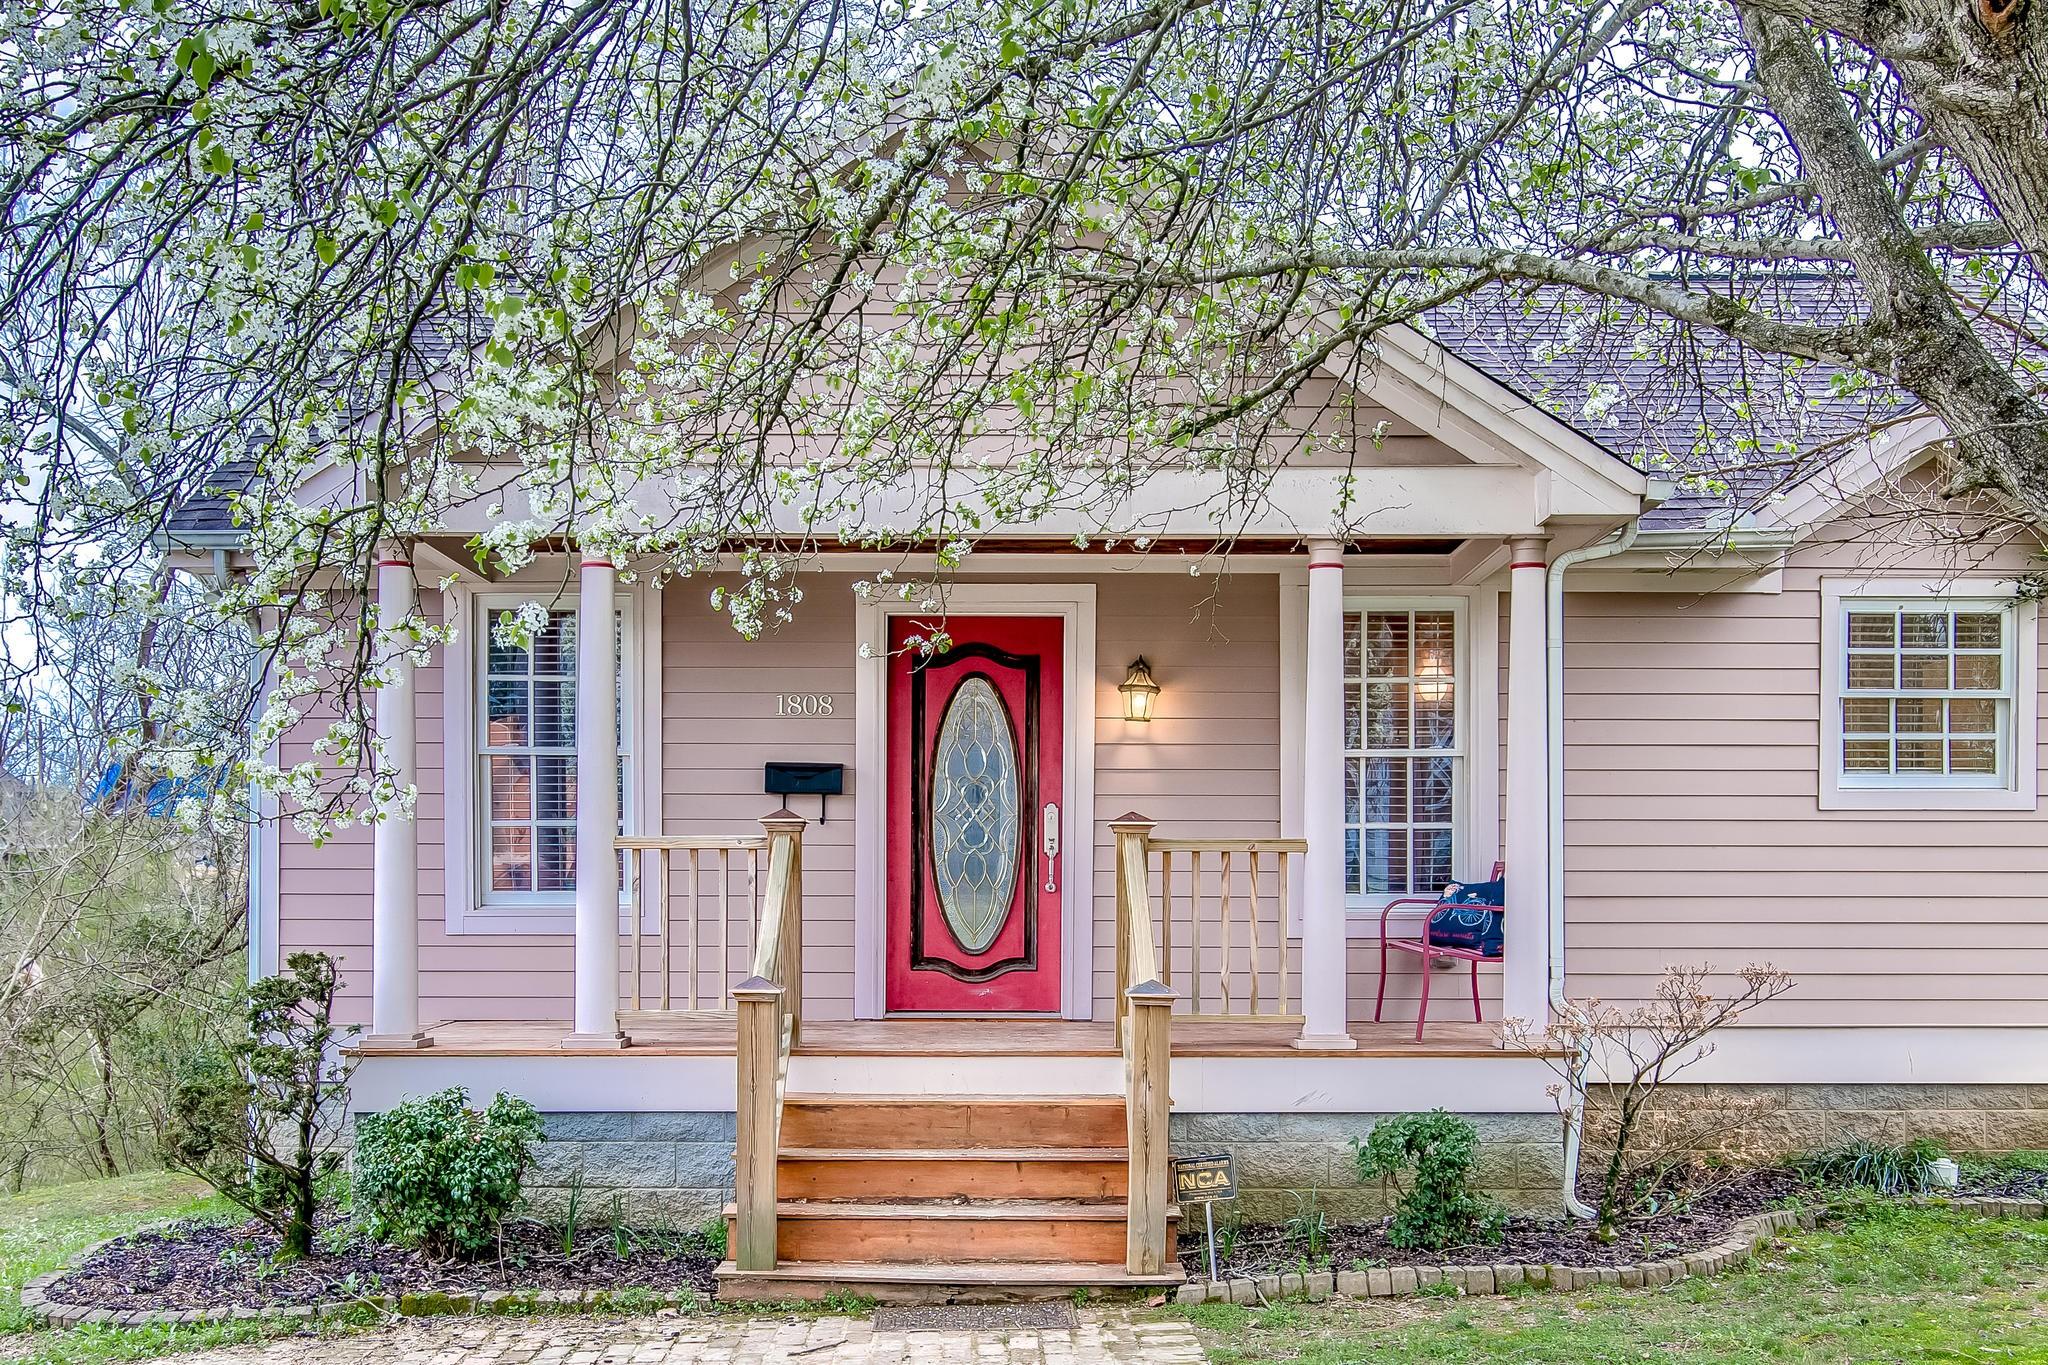 1808 Woodland St, Nashville, TN 37206 - Nashville, TN real estate listing